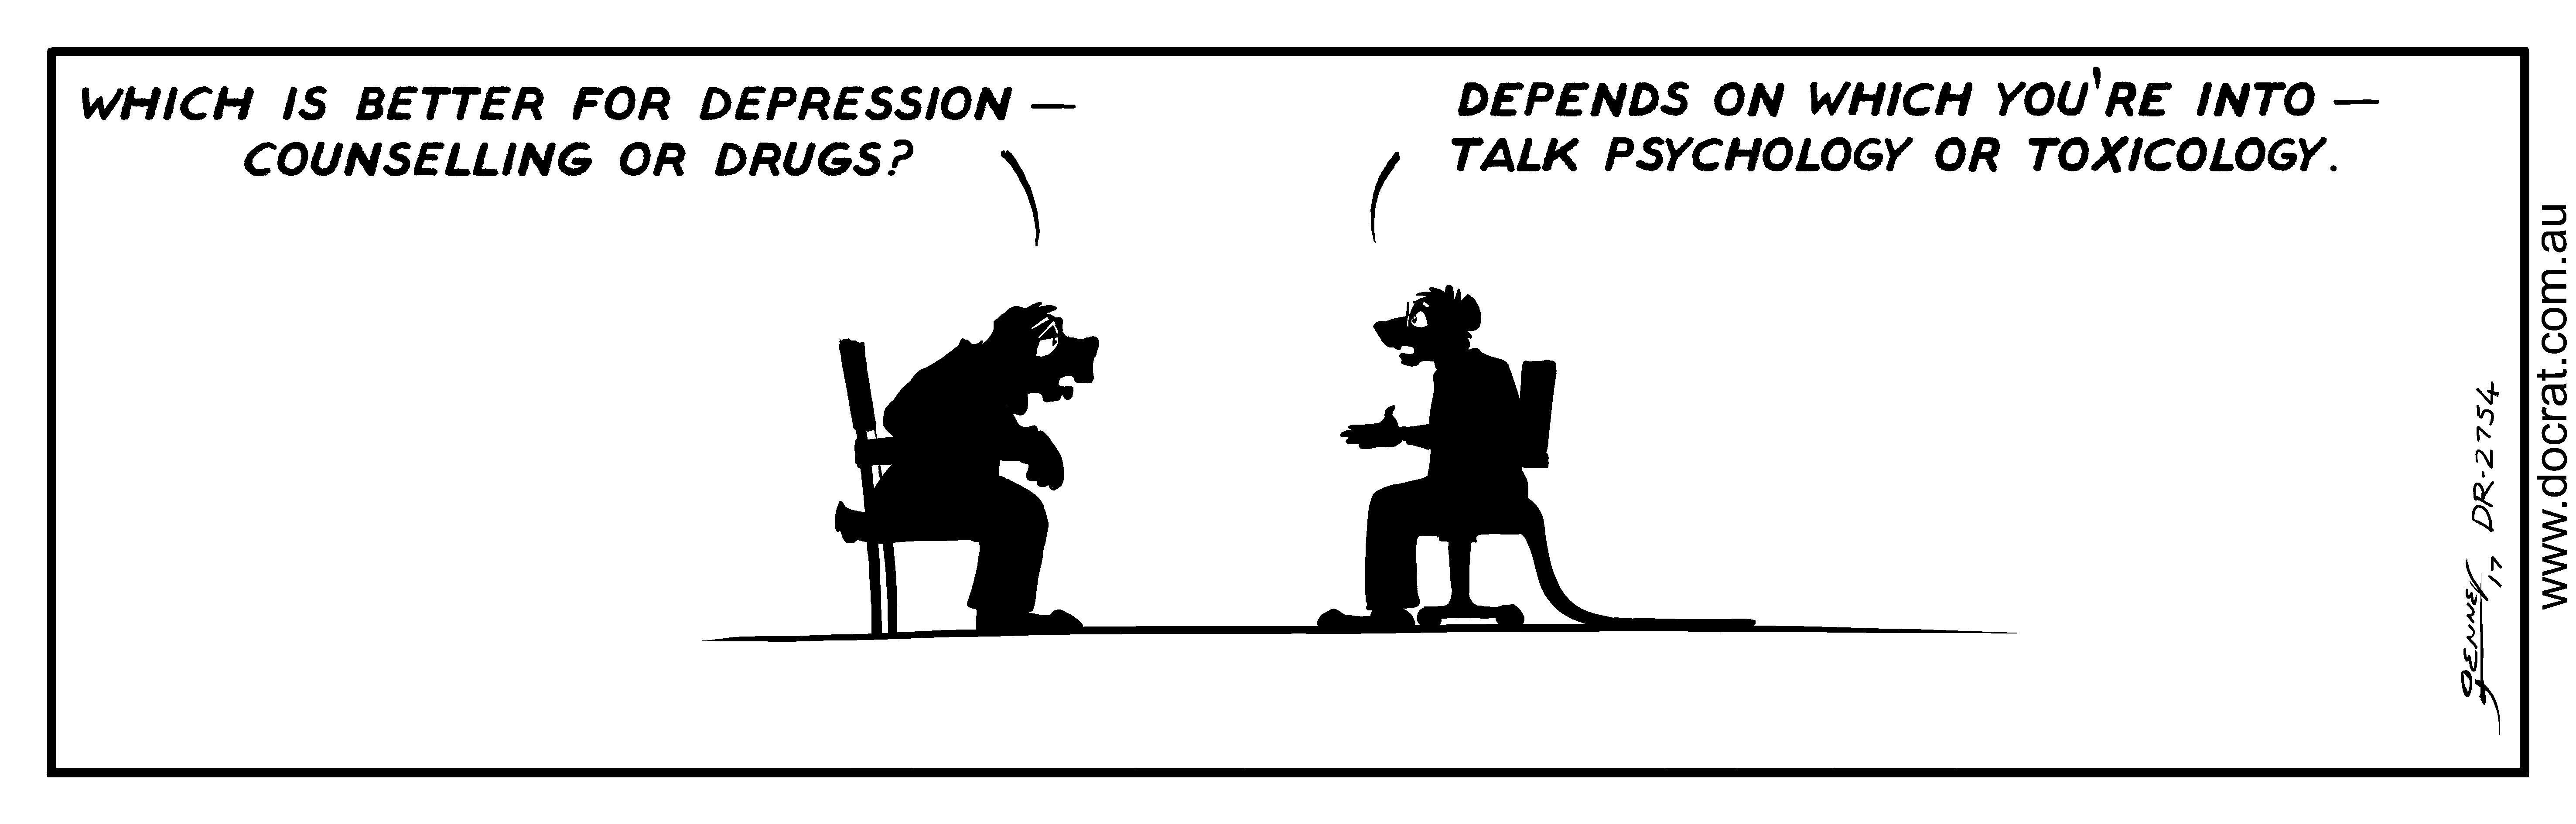 20170413